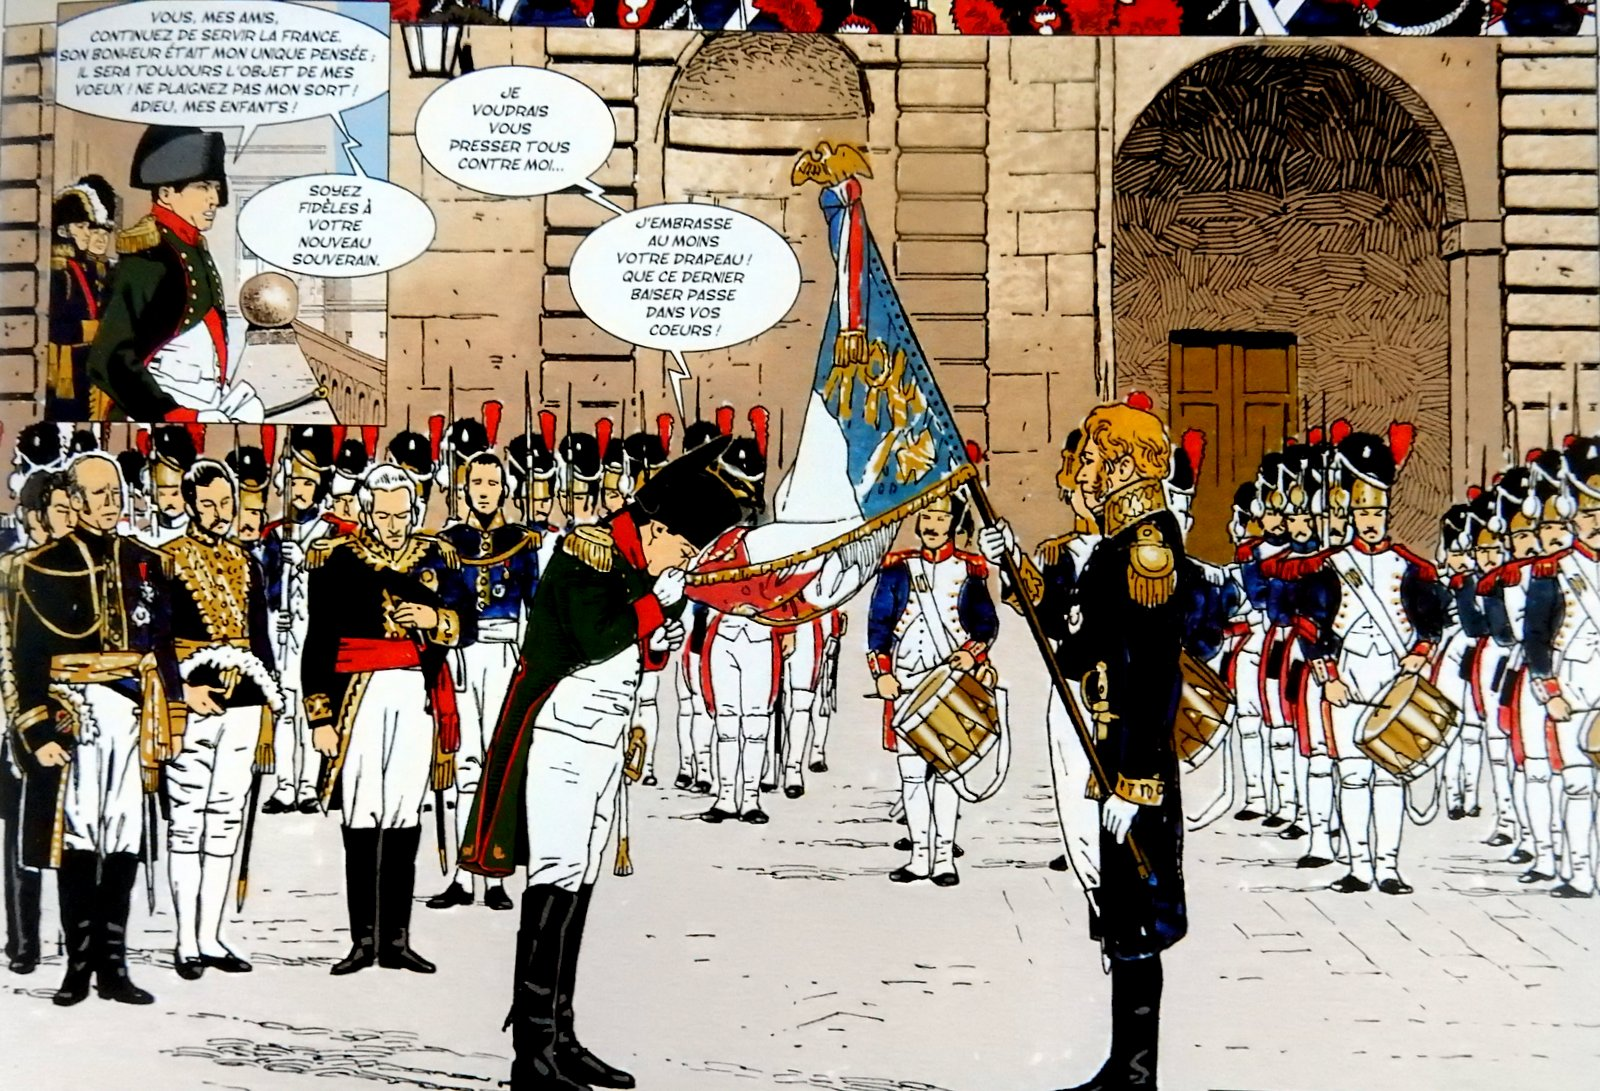 Napoléon Bonaparte - Tome 4 - Pascal Davoz - Jean Torton - Extraits (1)